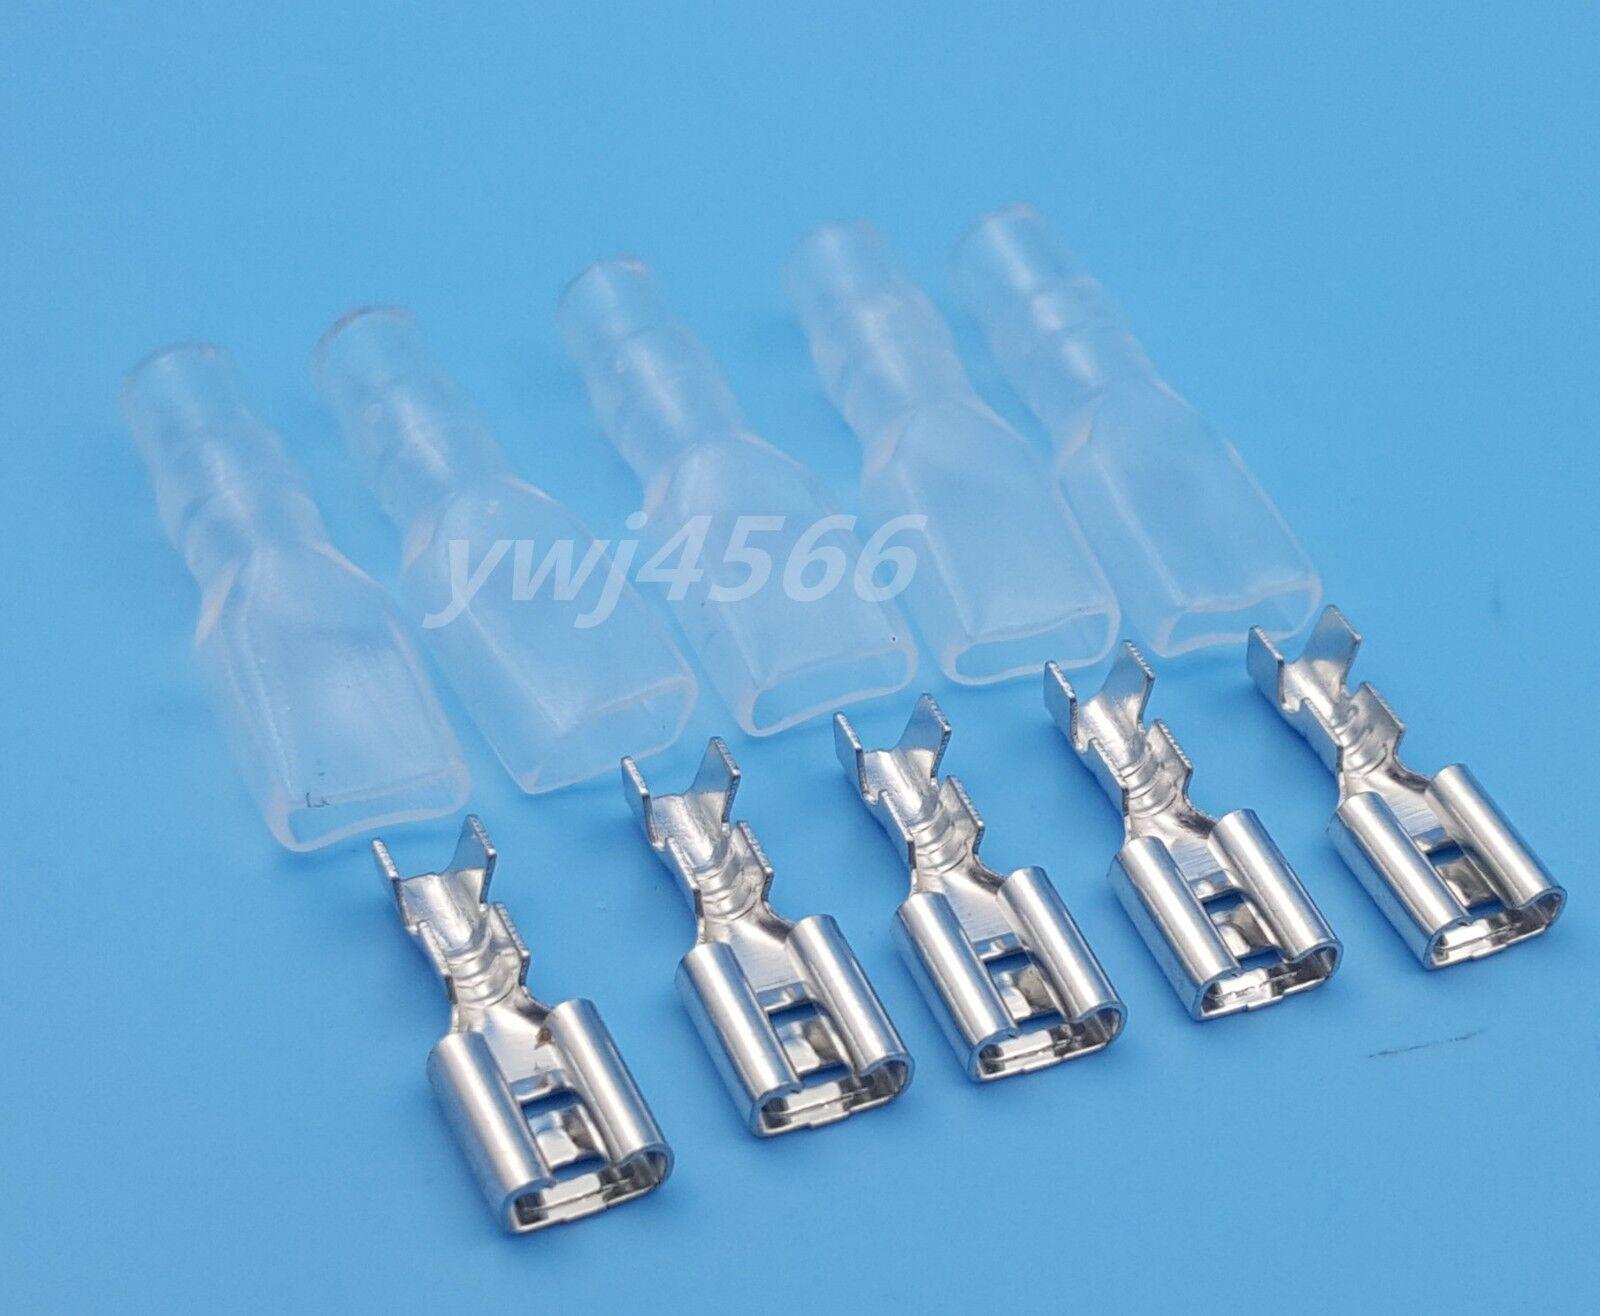 100pcs Female 4.8mm Spade Insulated Electrical Wiring Crimp Terminal ...